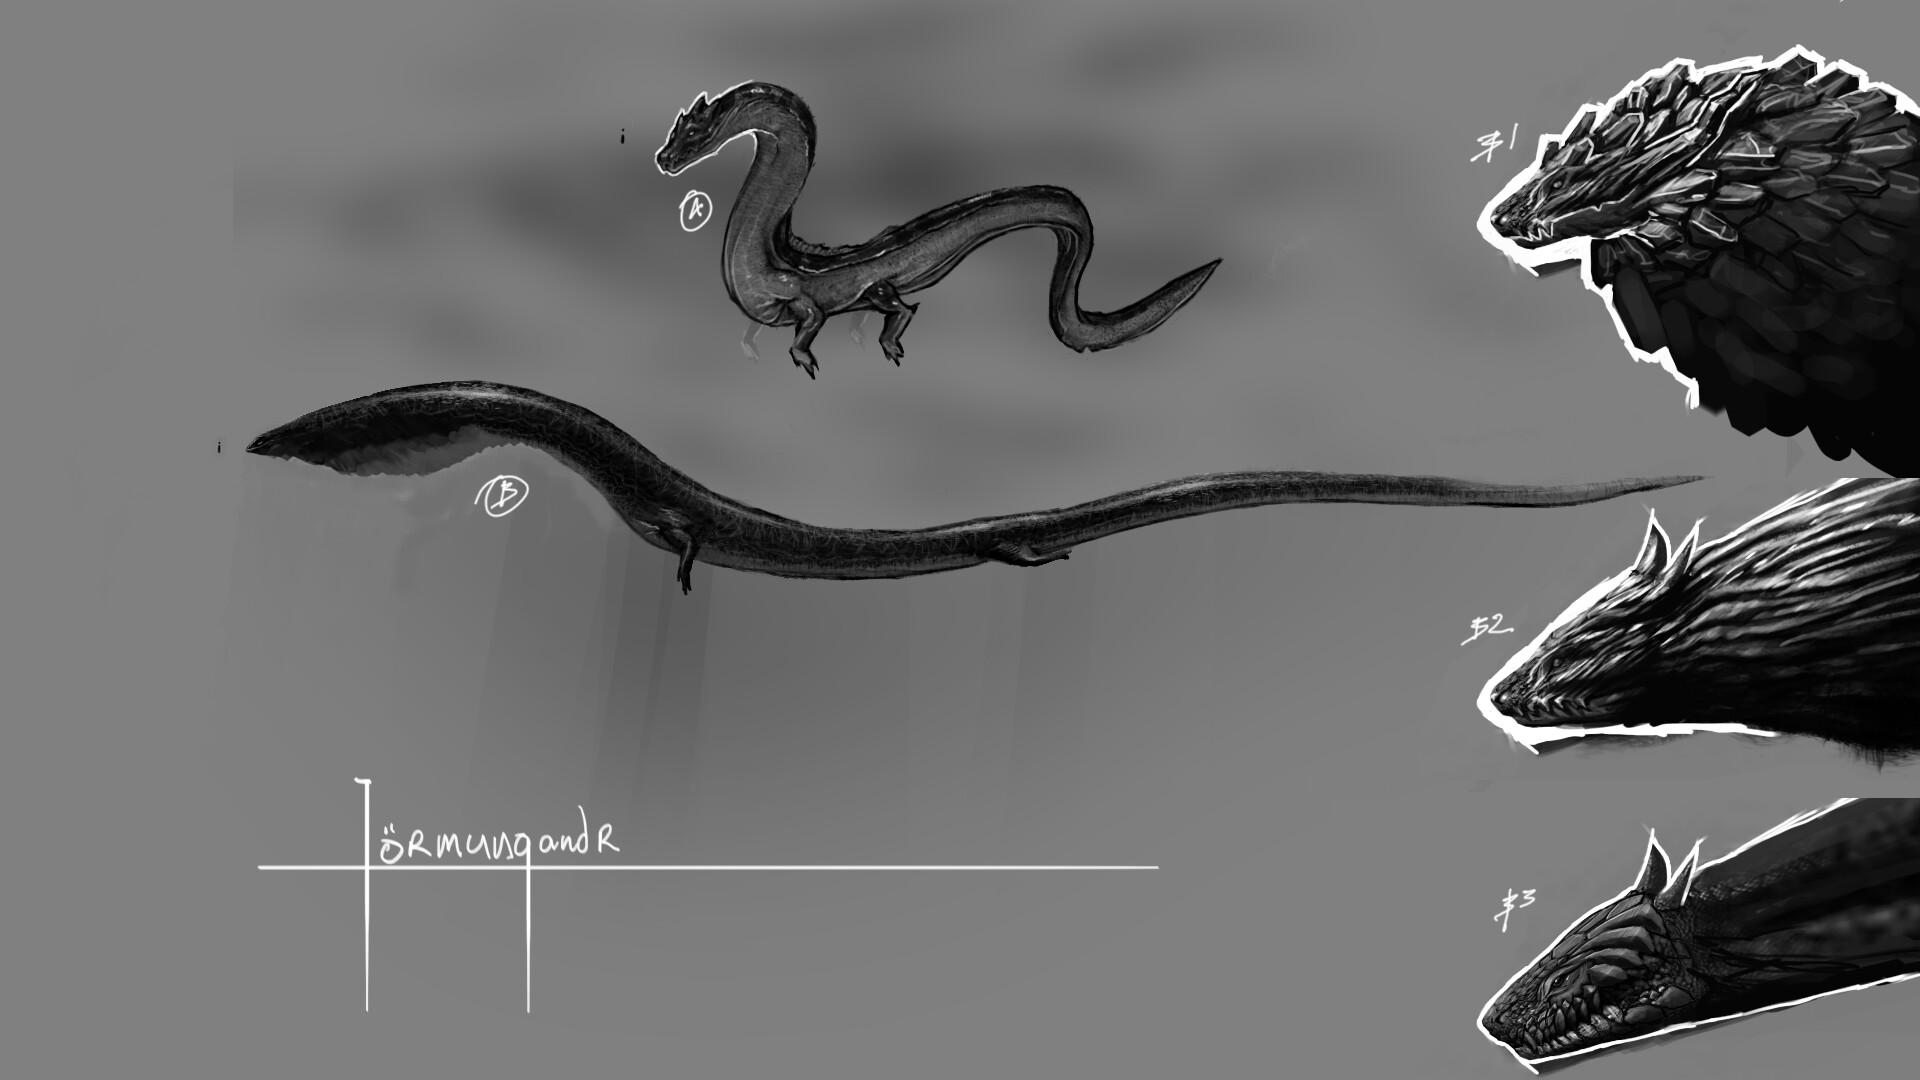 Fatih gurdal leviathan